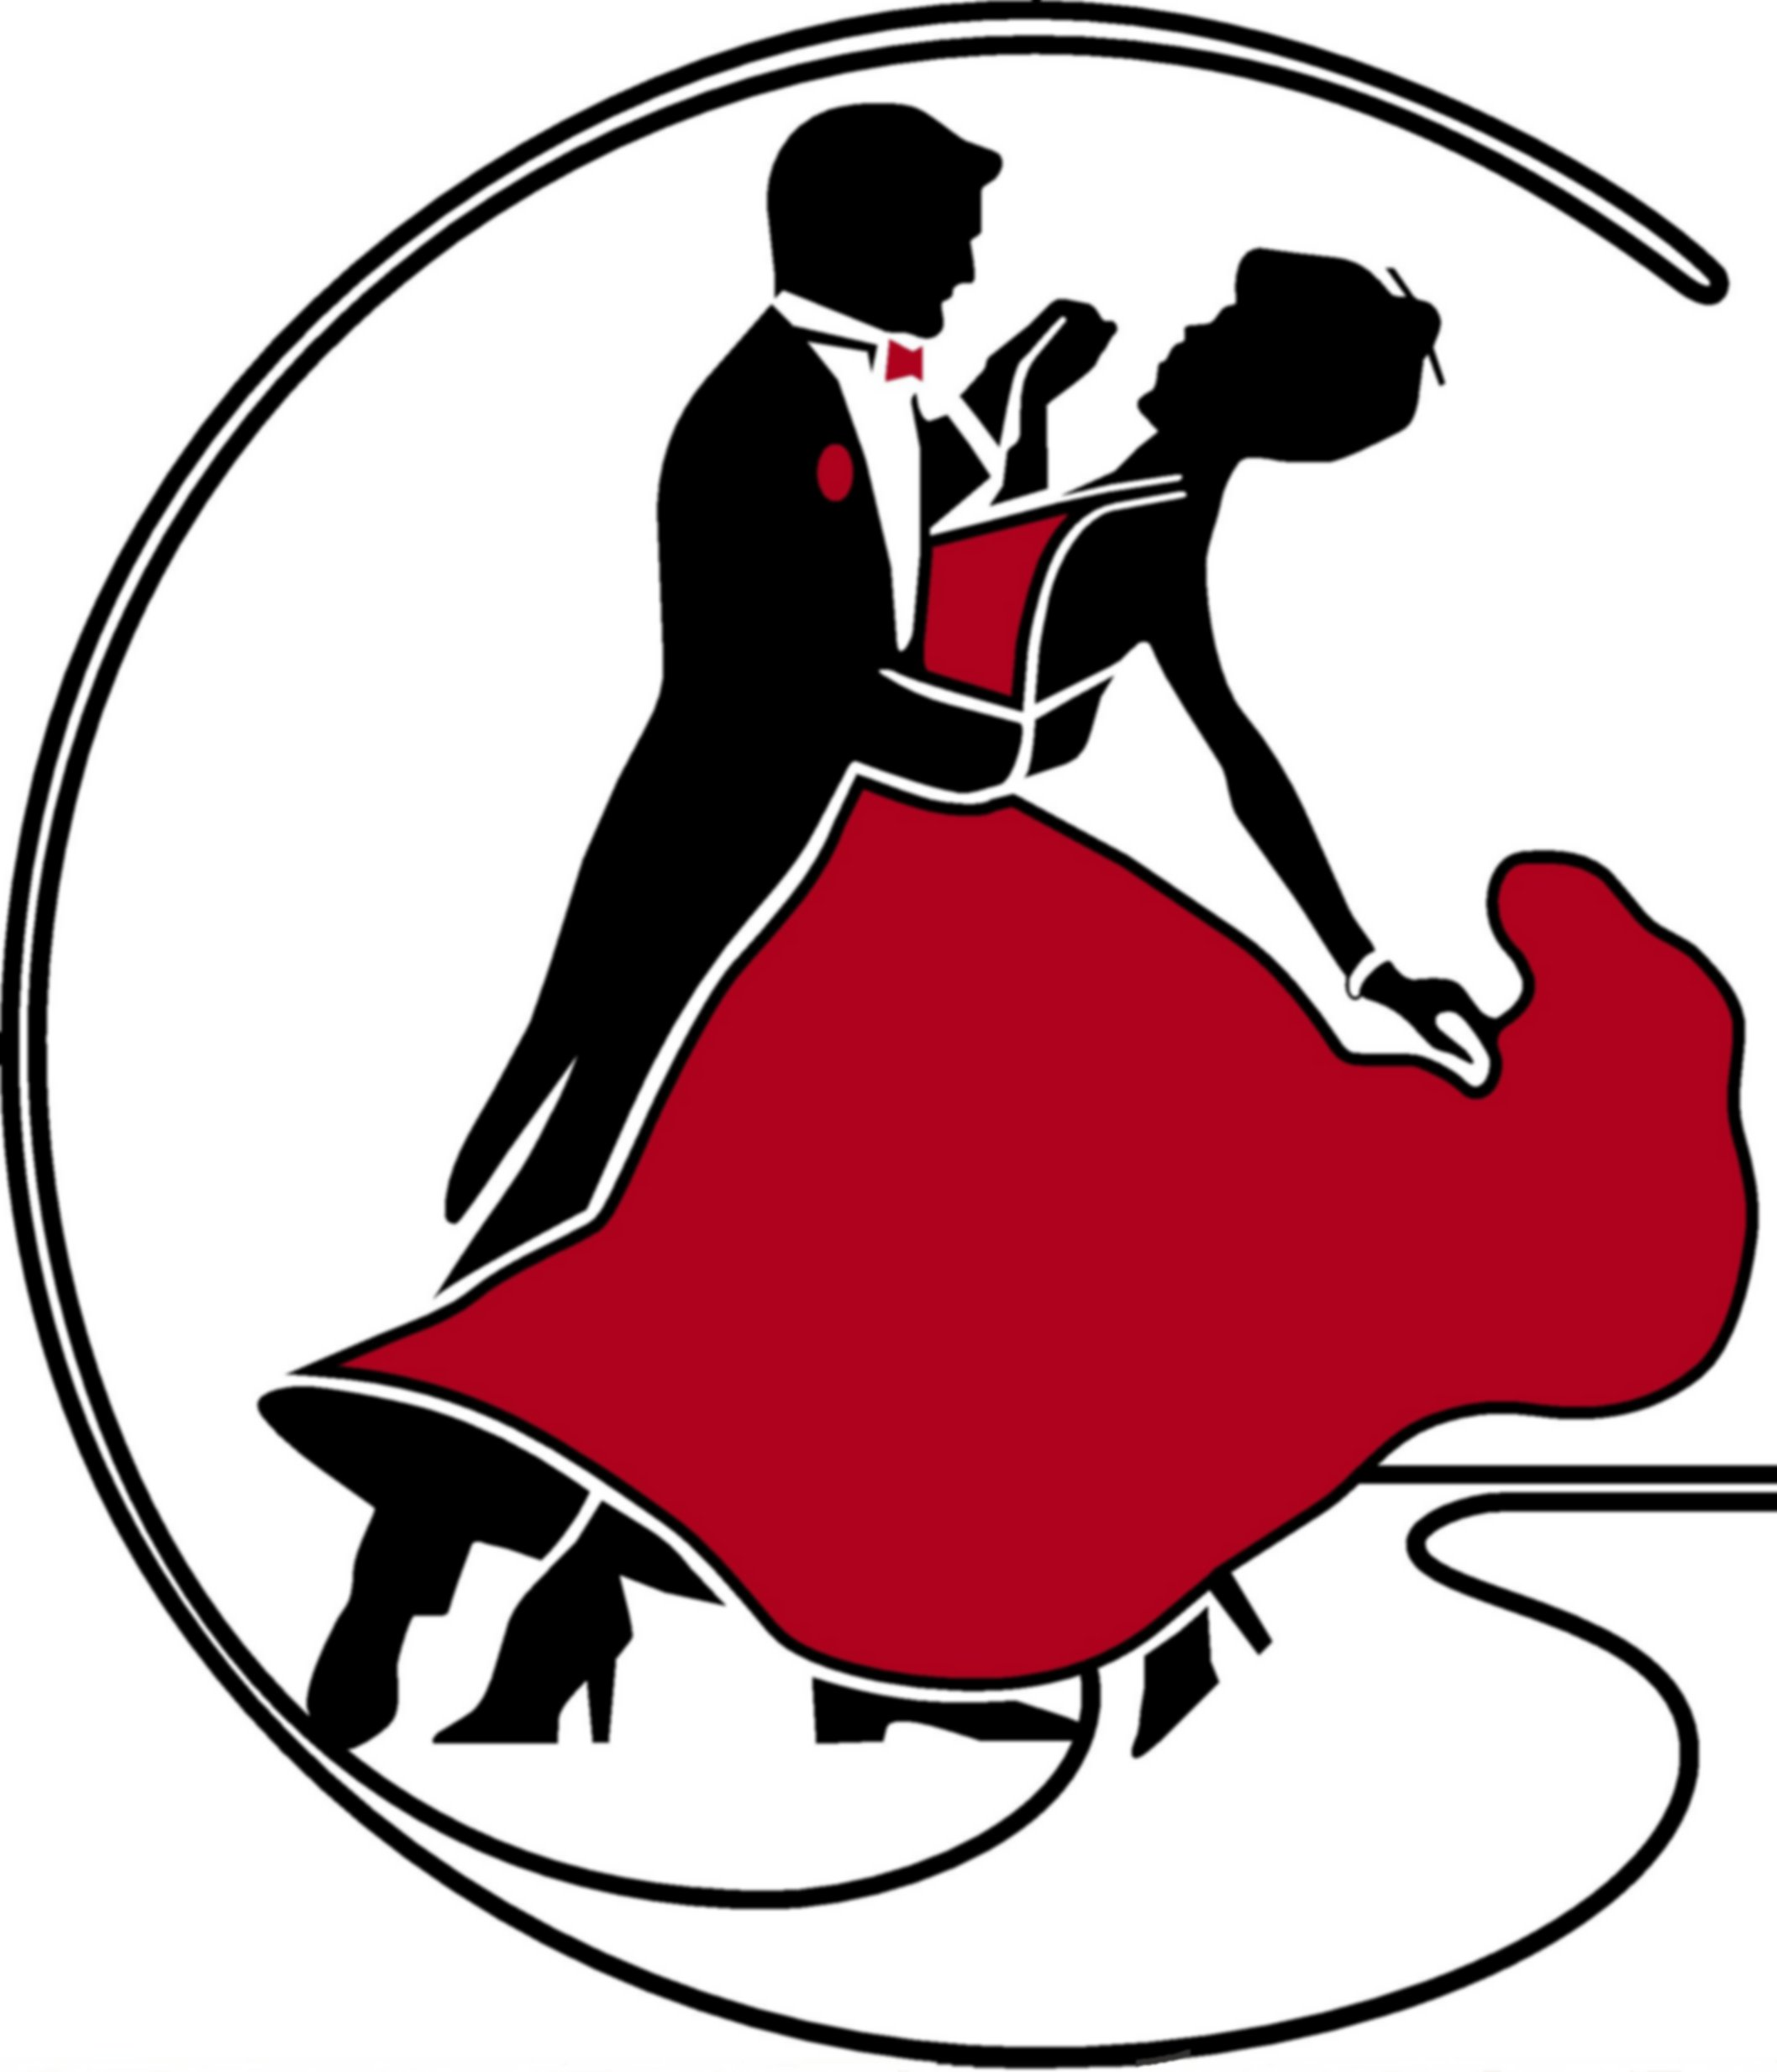 K.o.p.e.l. clipart ballroom dancing Images dancing Collection art dancing